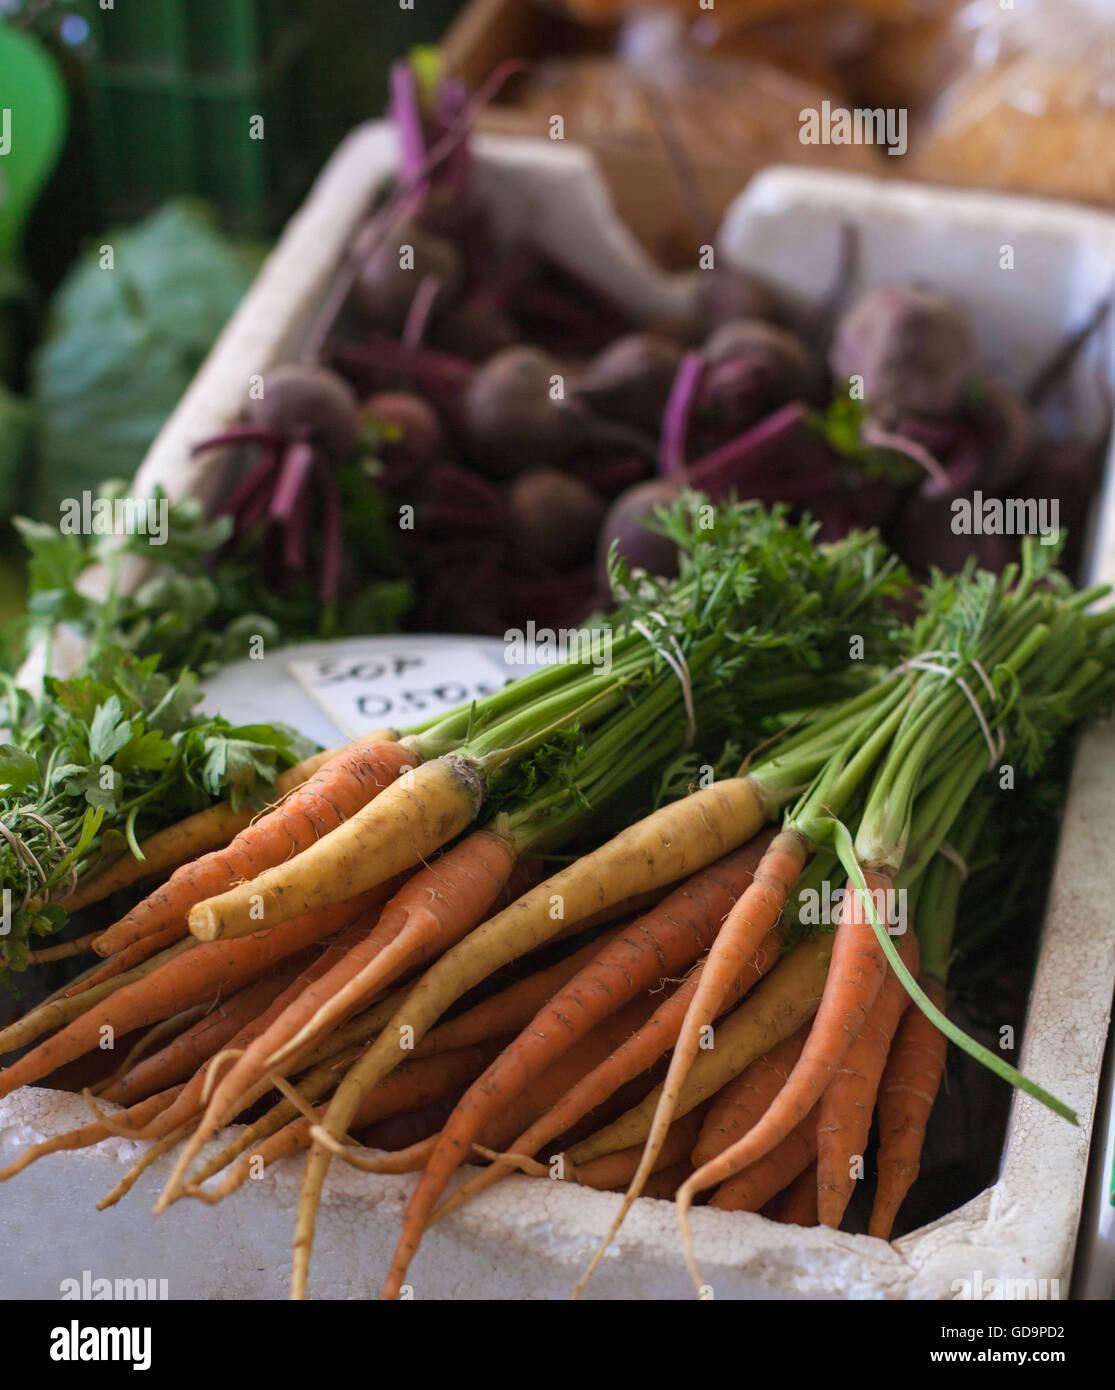 Fresh carrots at the green market - Stock Image